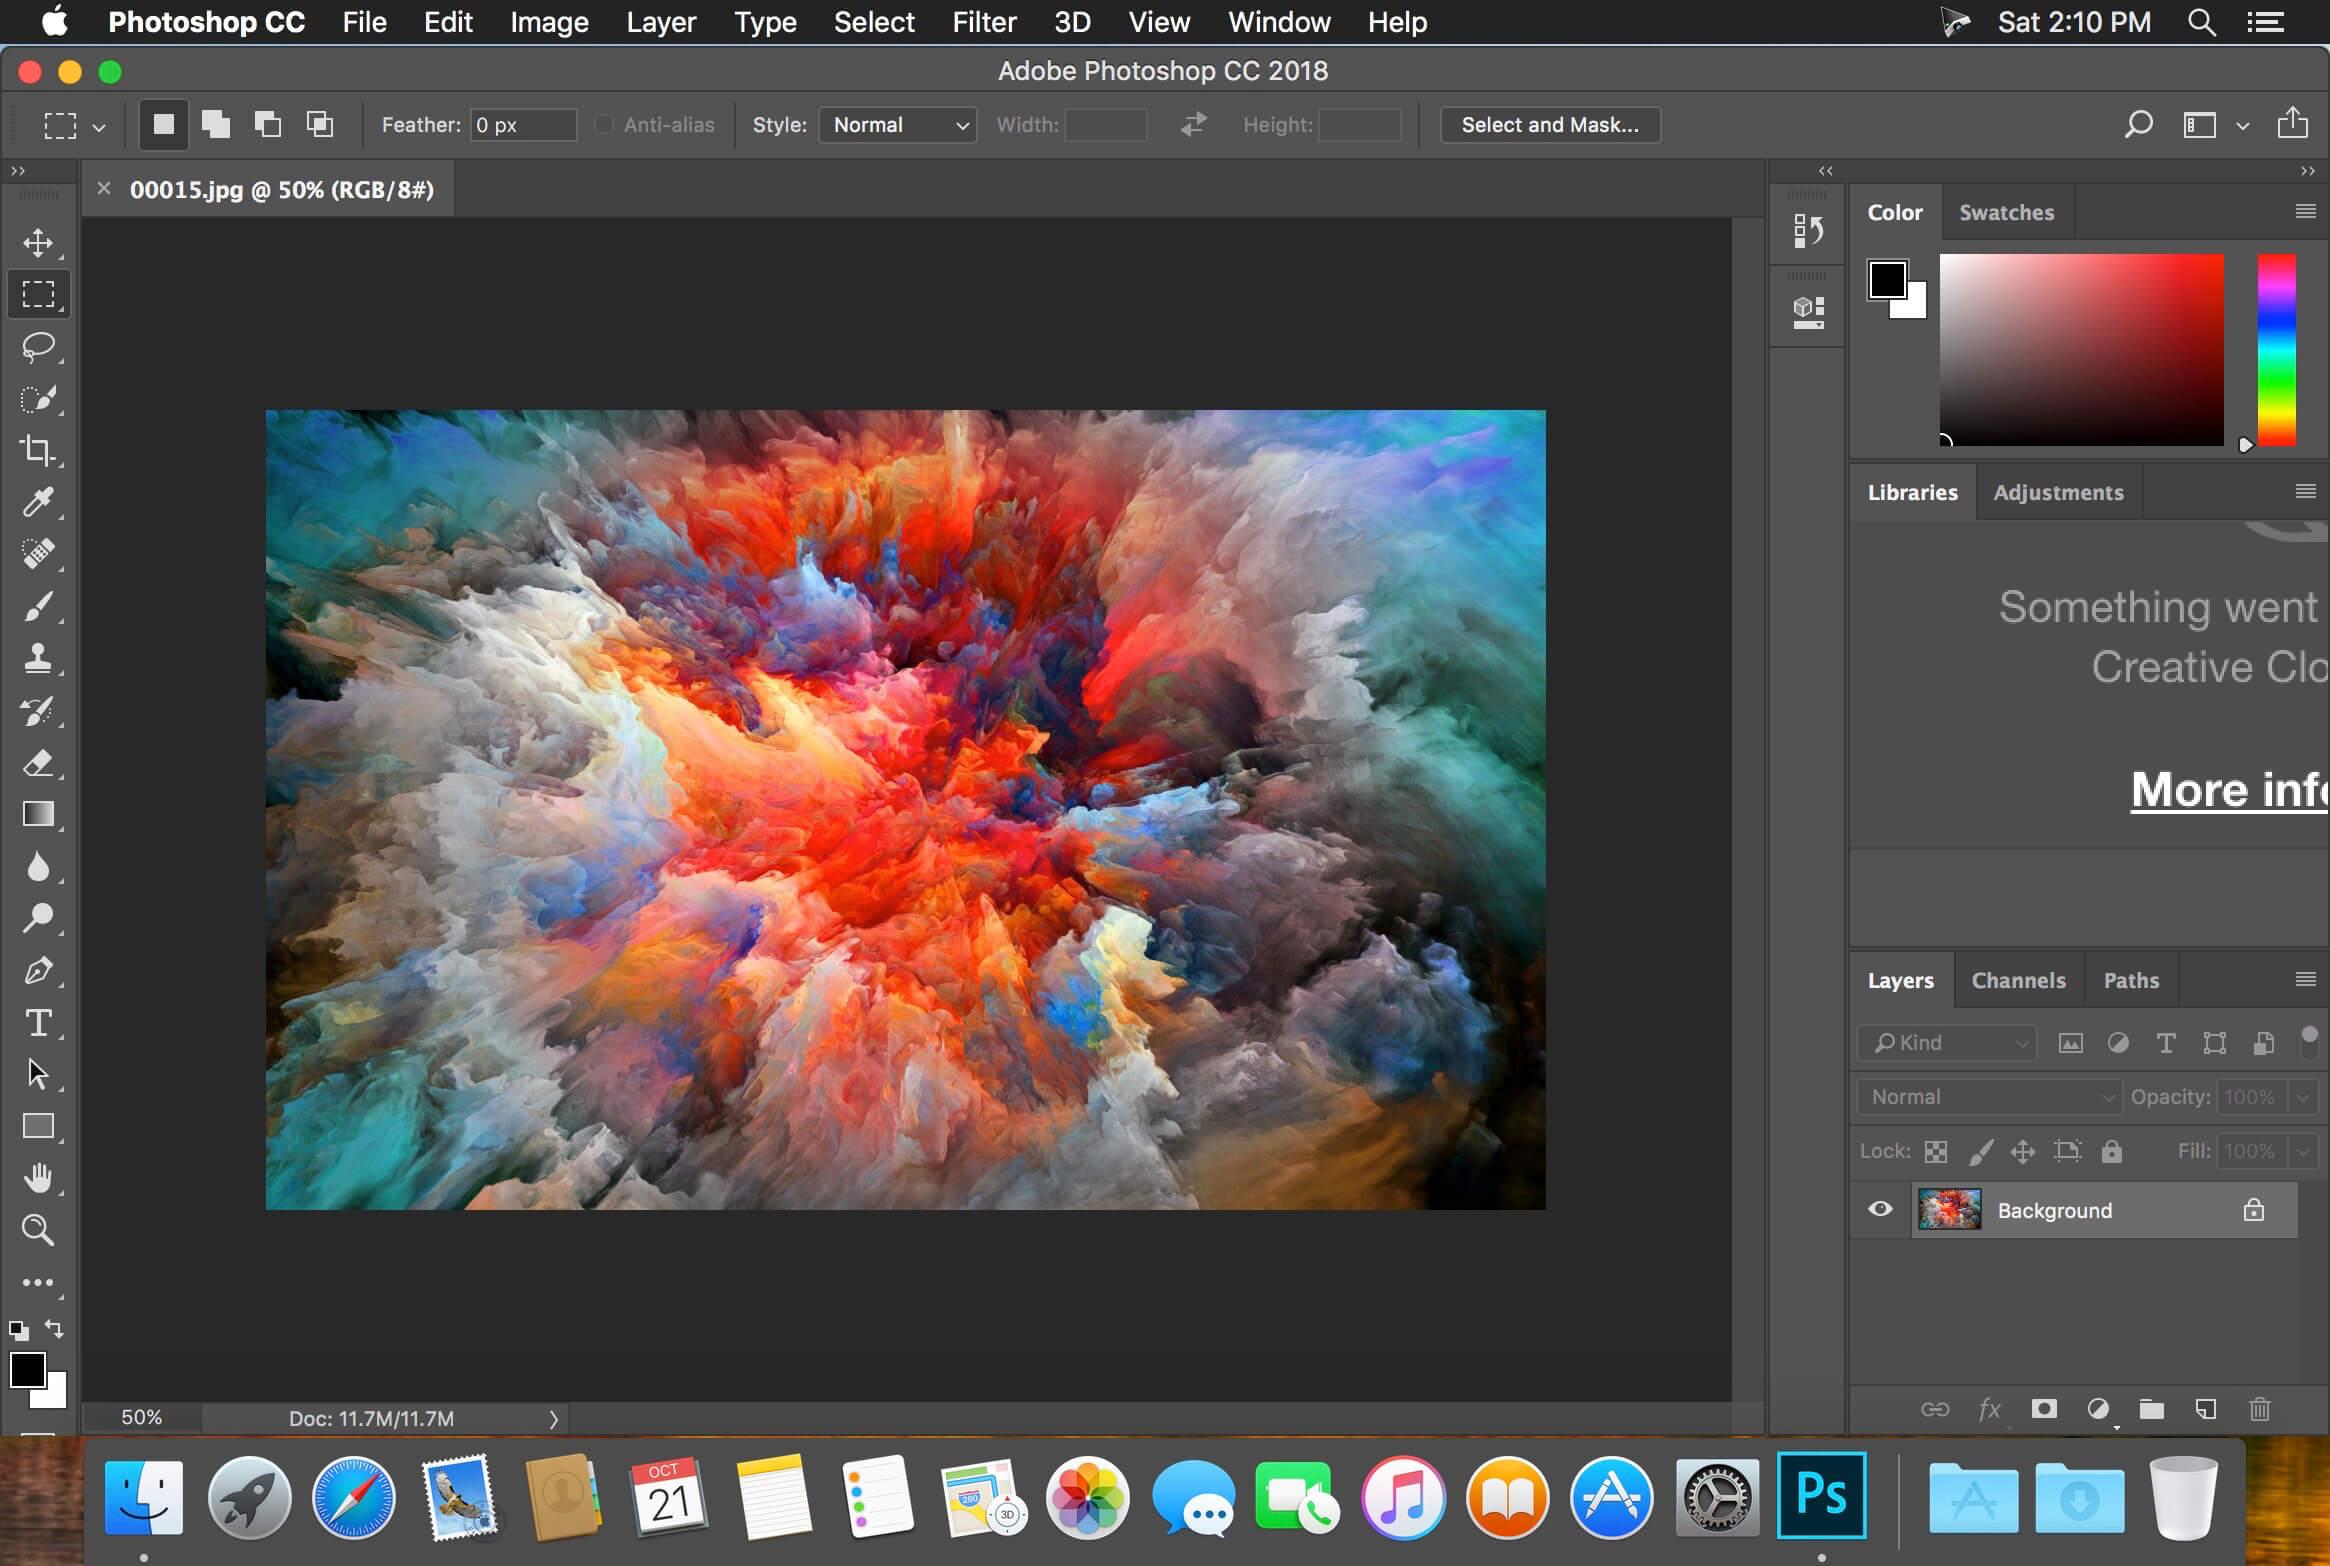 Adobe Photoshop CC 2018 v19 1 6 download | macOS